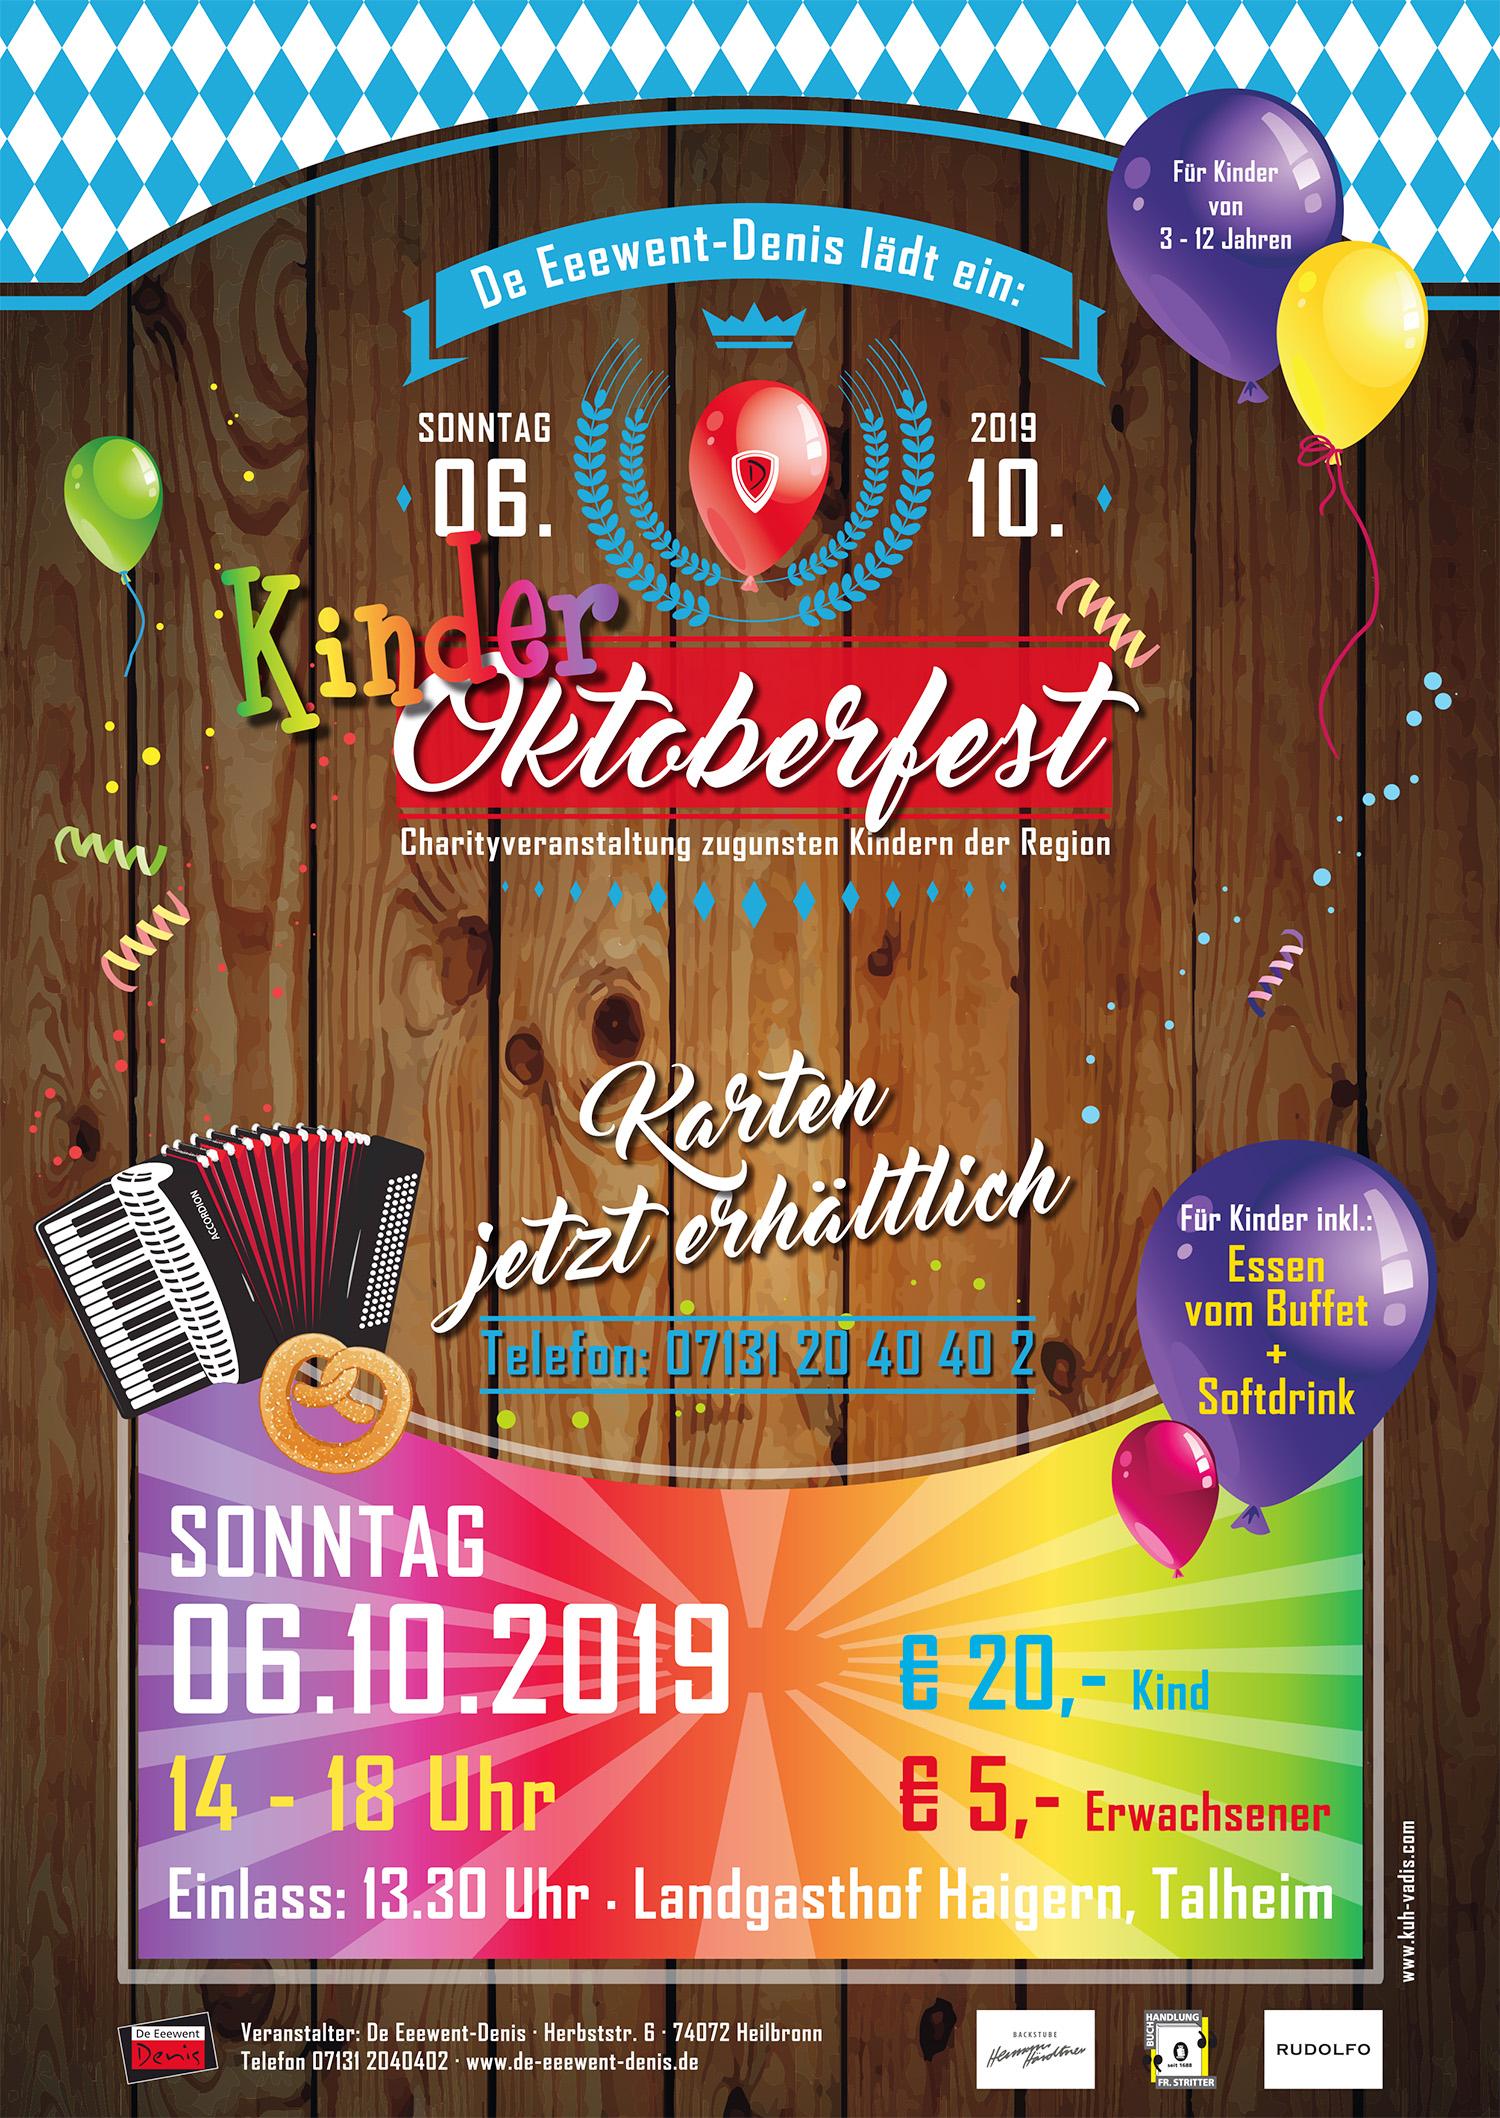 KINDER-Oktoberfest 2019